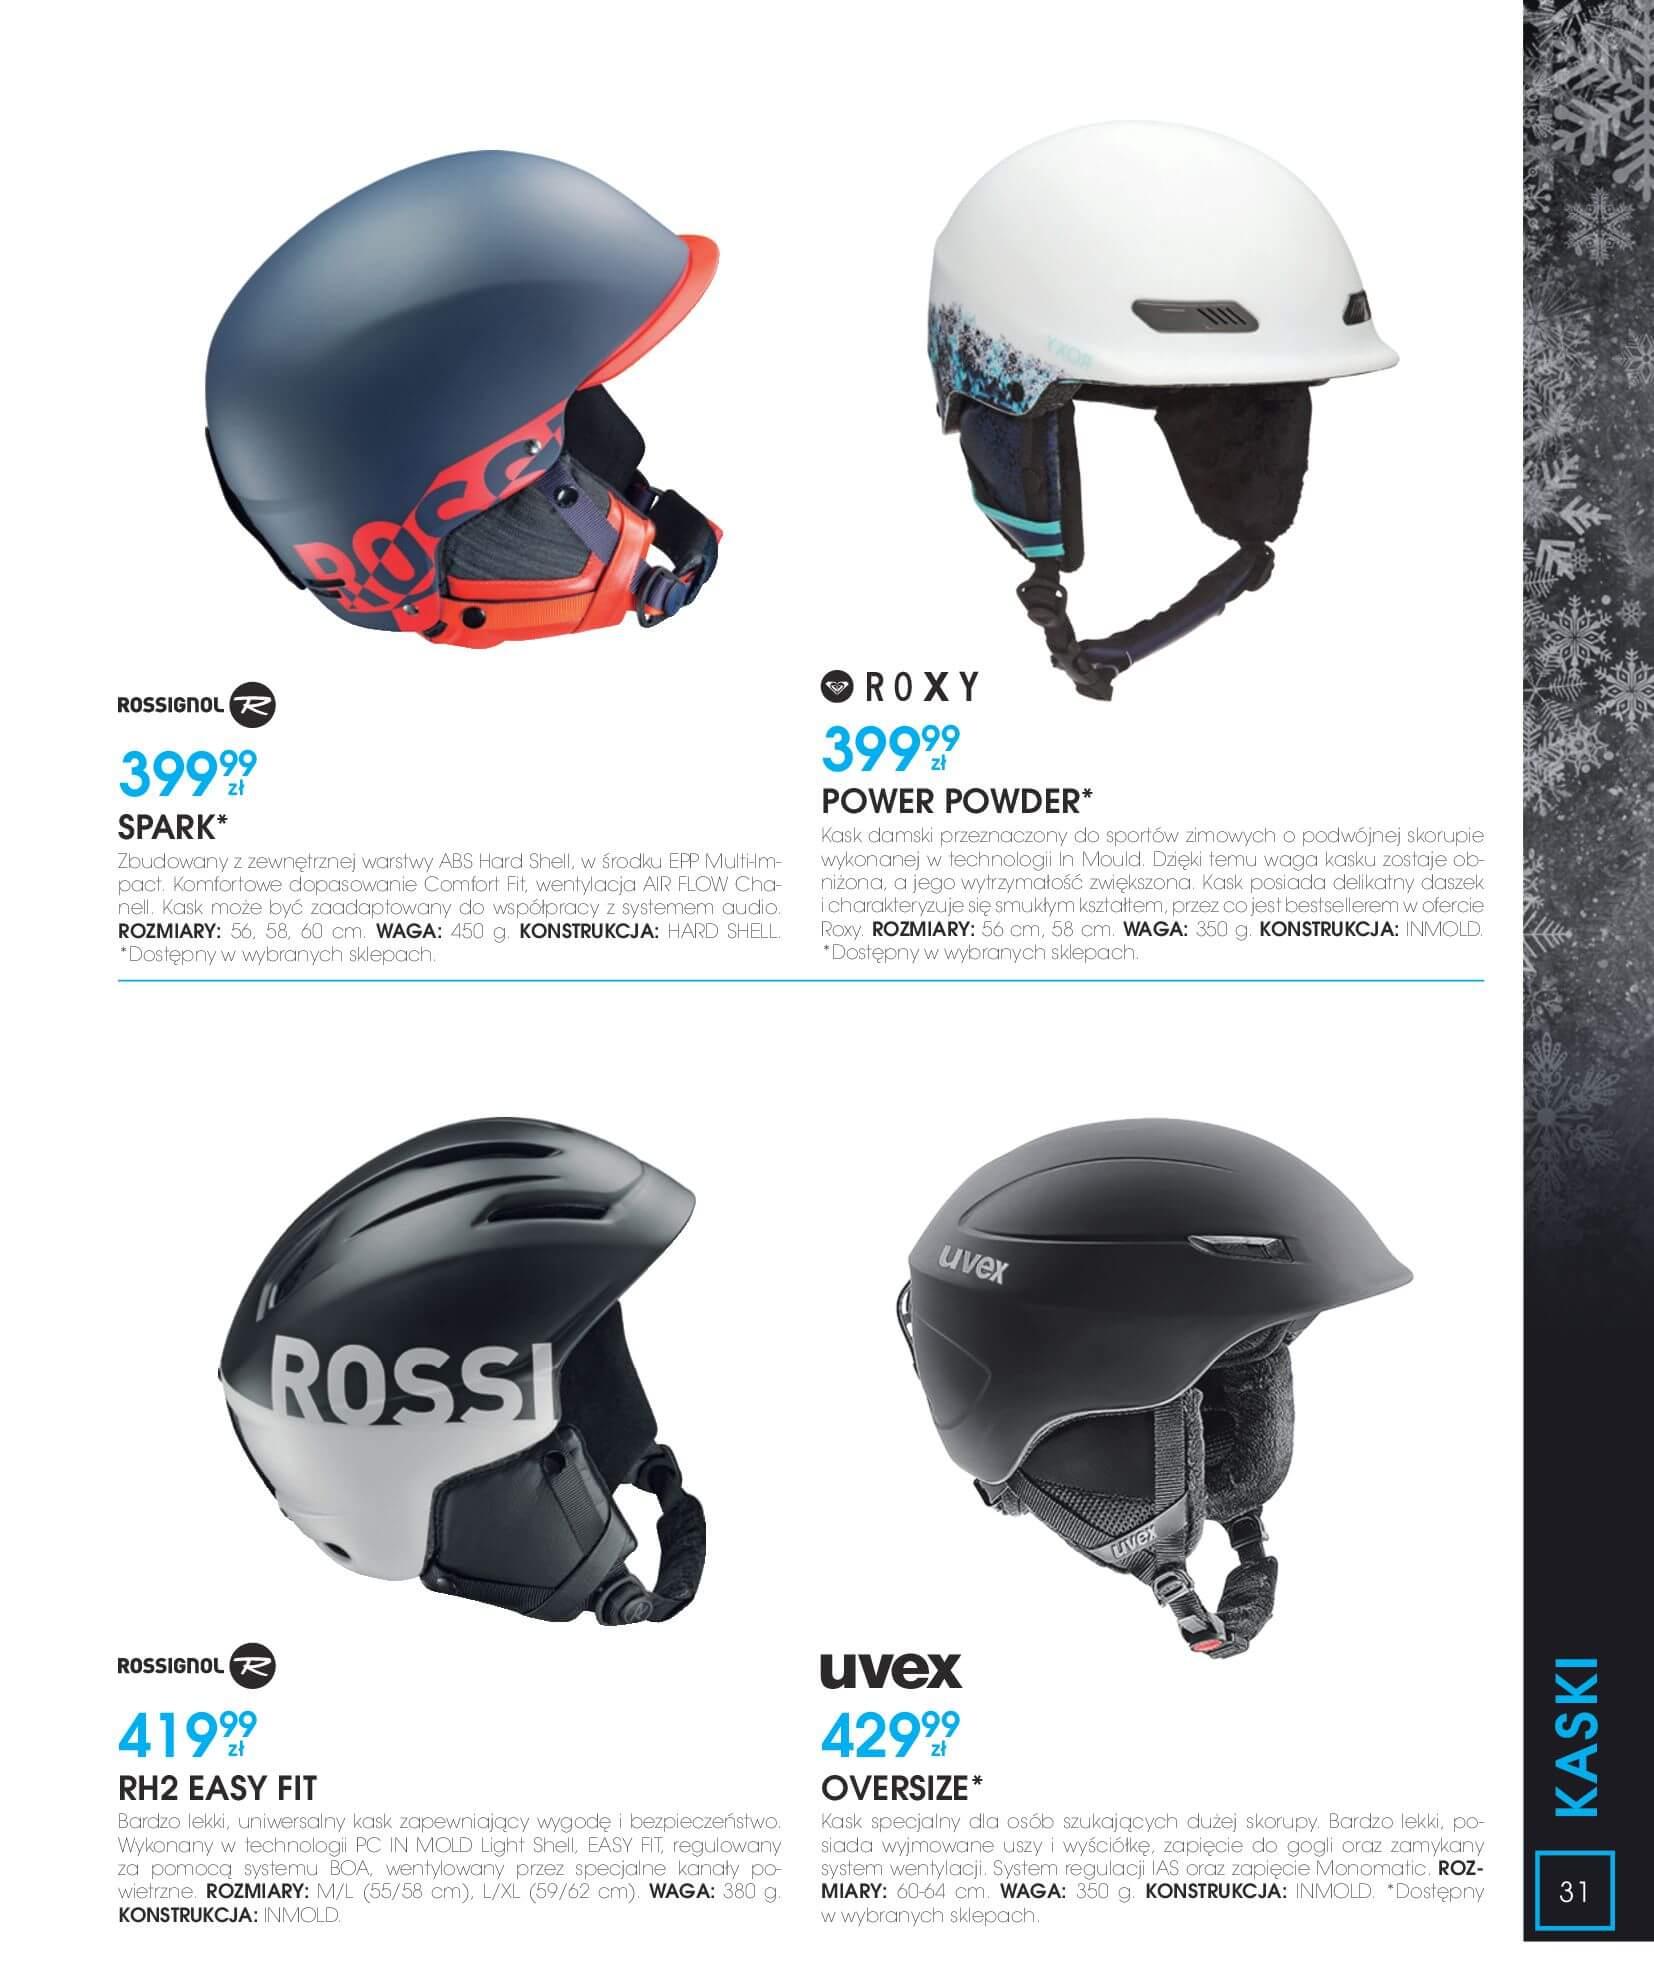 Gazetka Go Sport - Katalog Zima 2017/2018-12.11.2017-28.02.2018-page-31